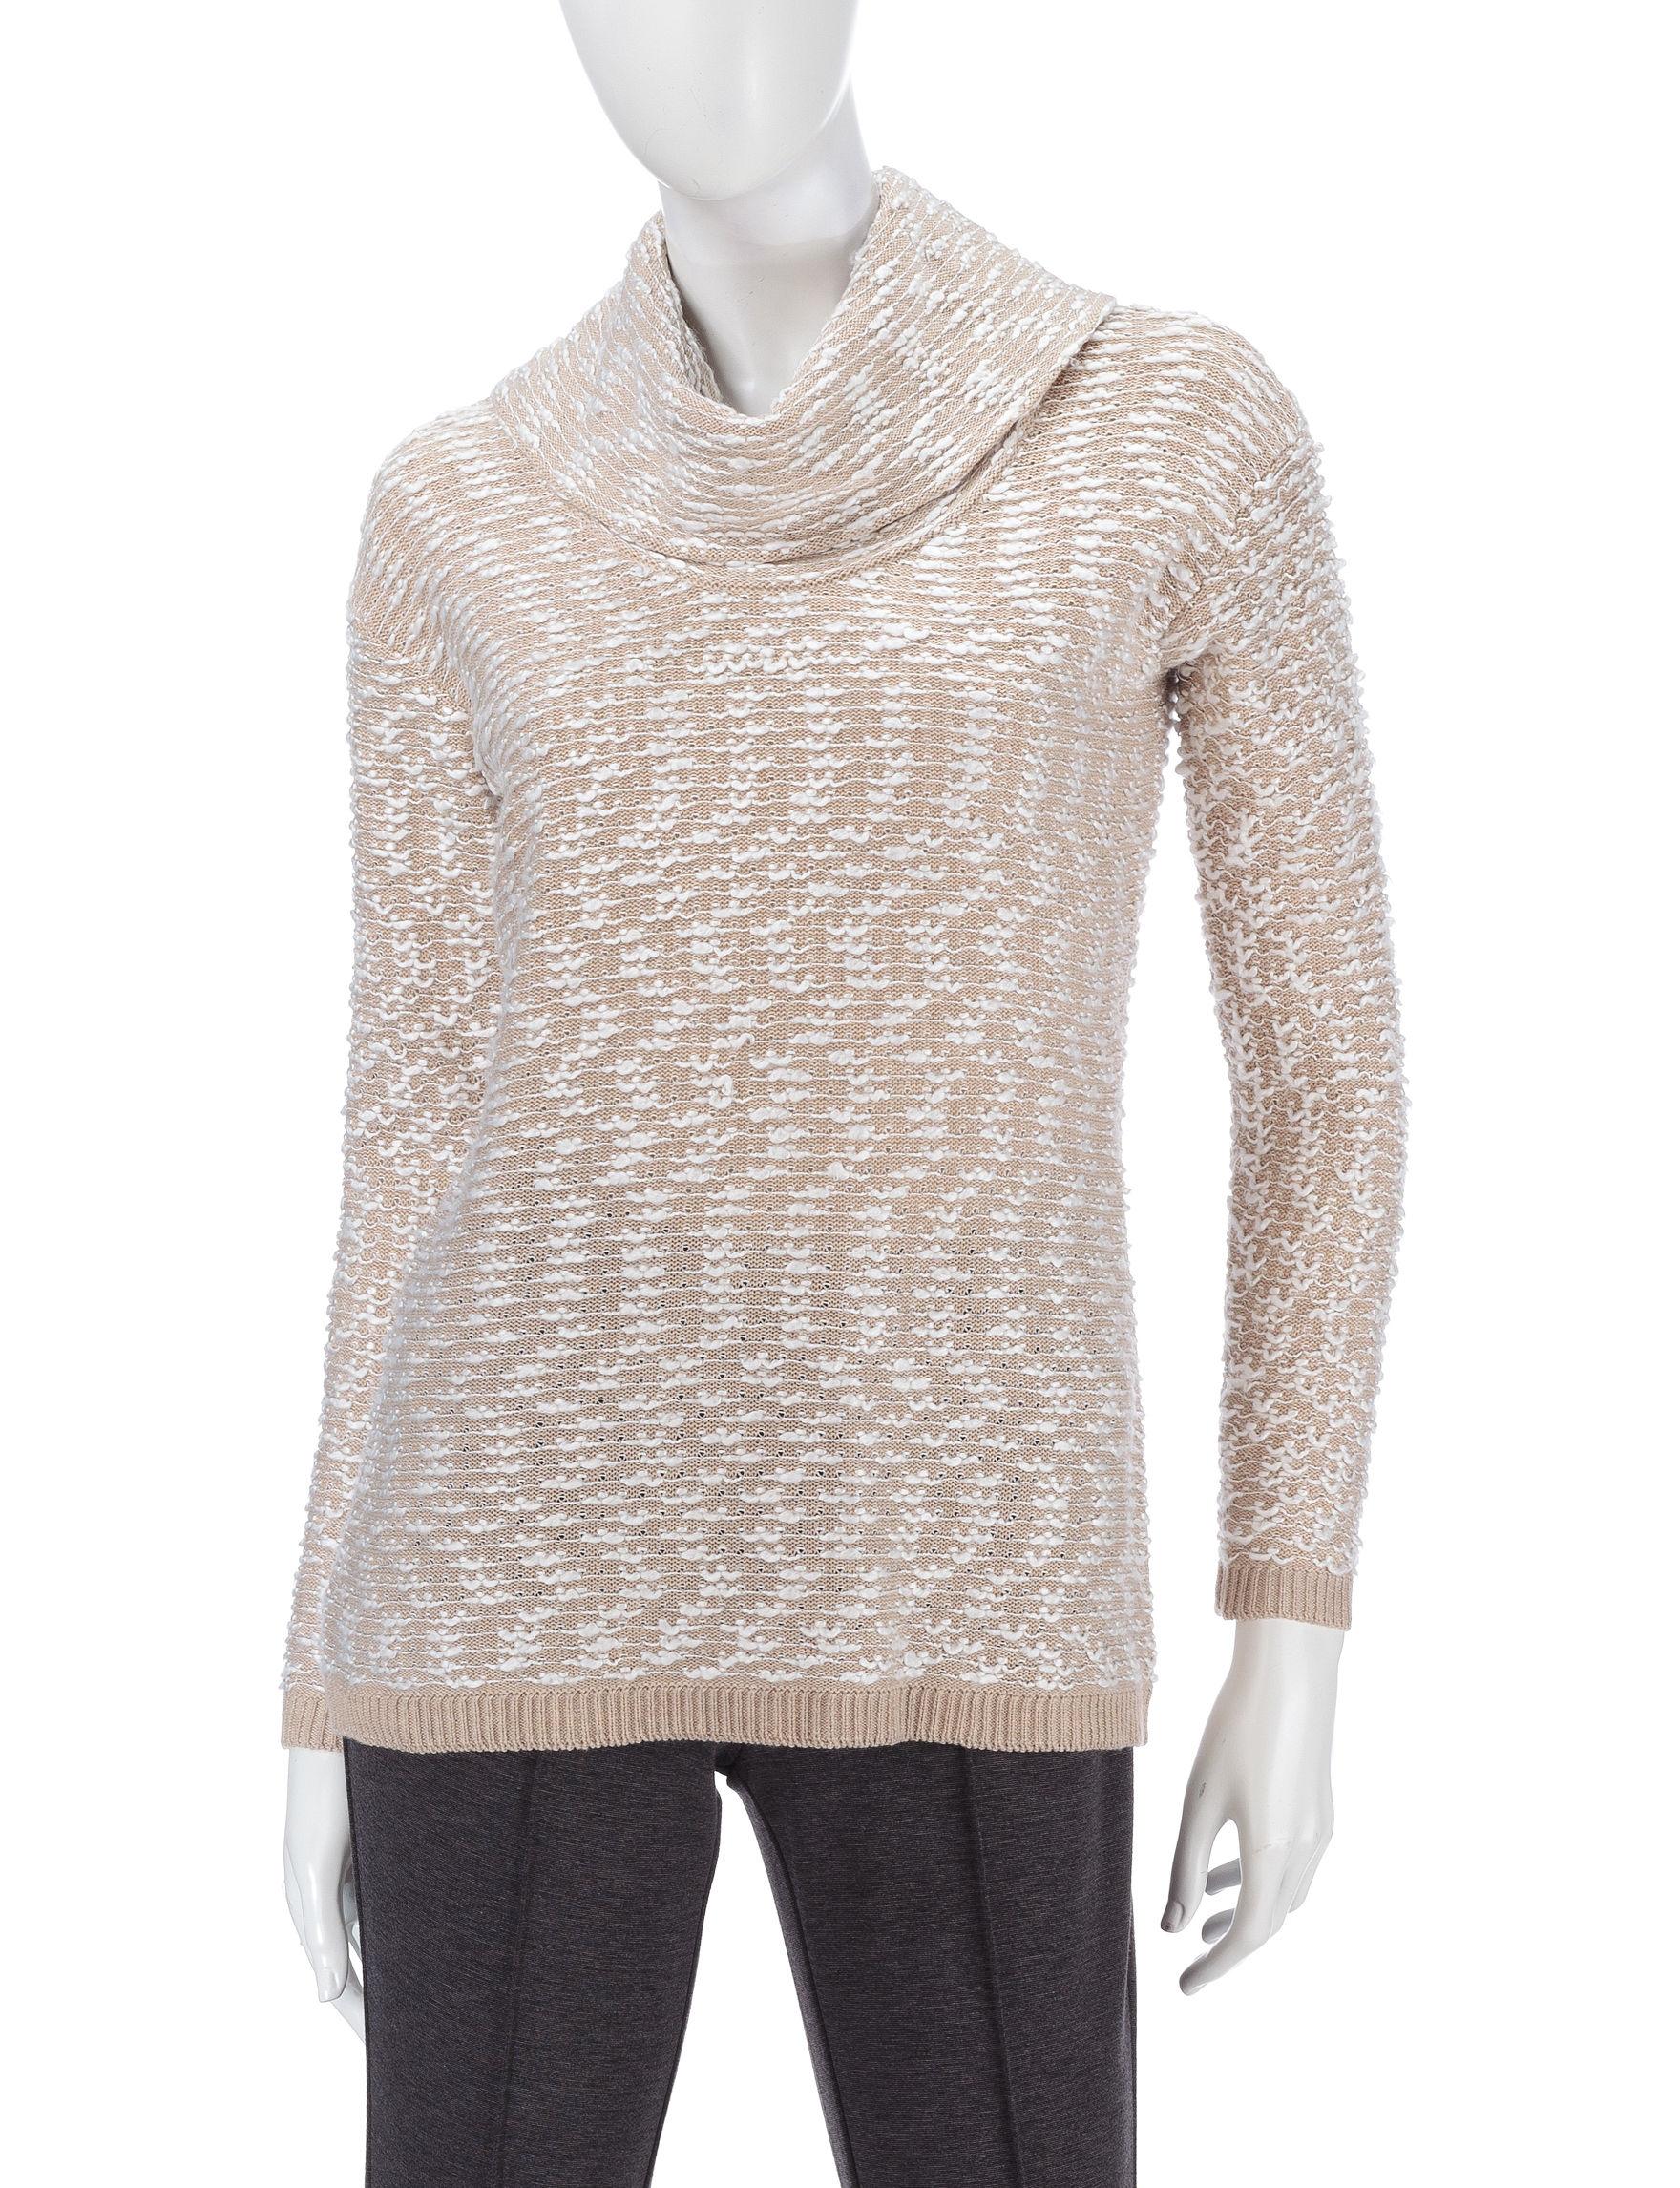 Calvin Klein Tan Multi Pull-overs Sweaters